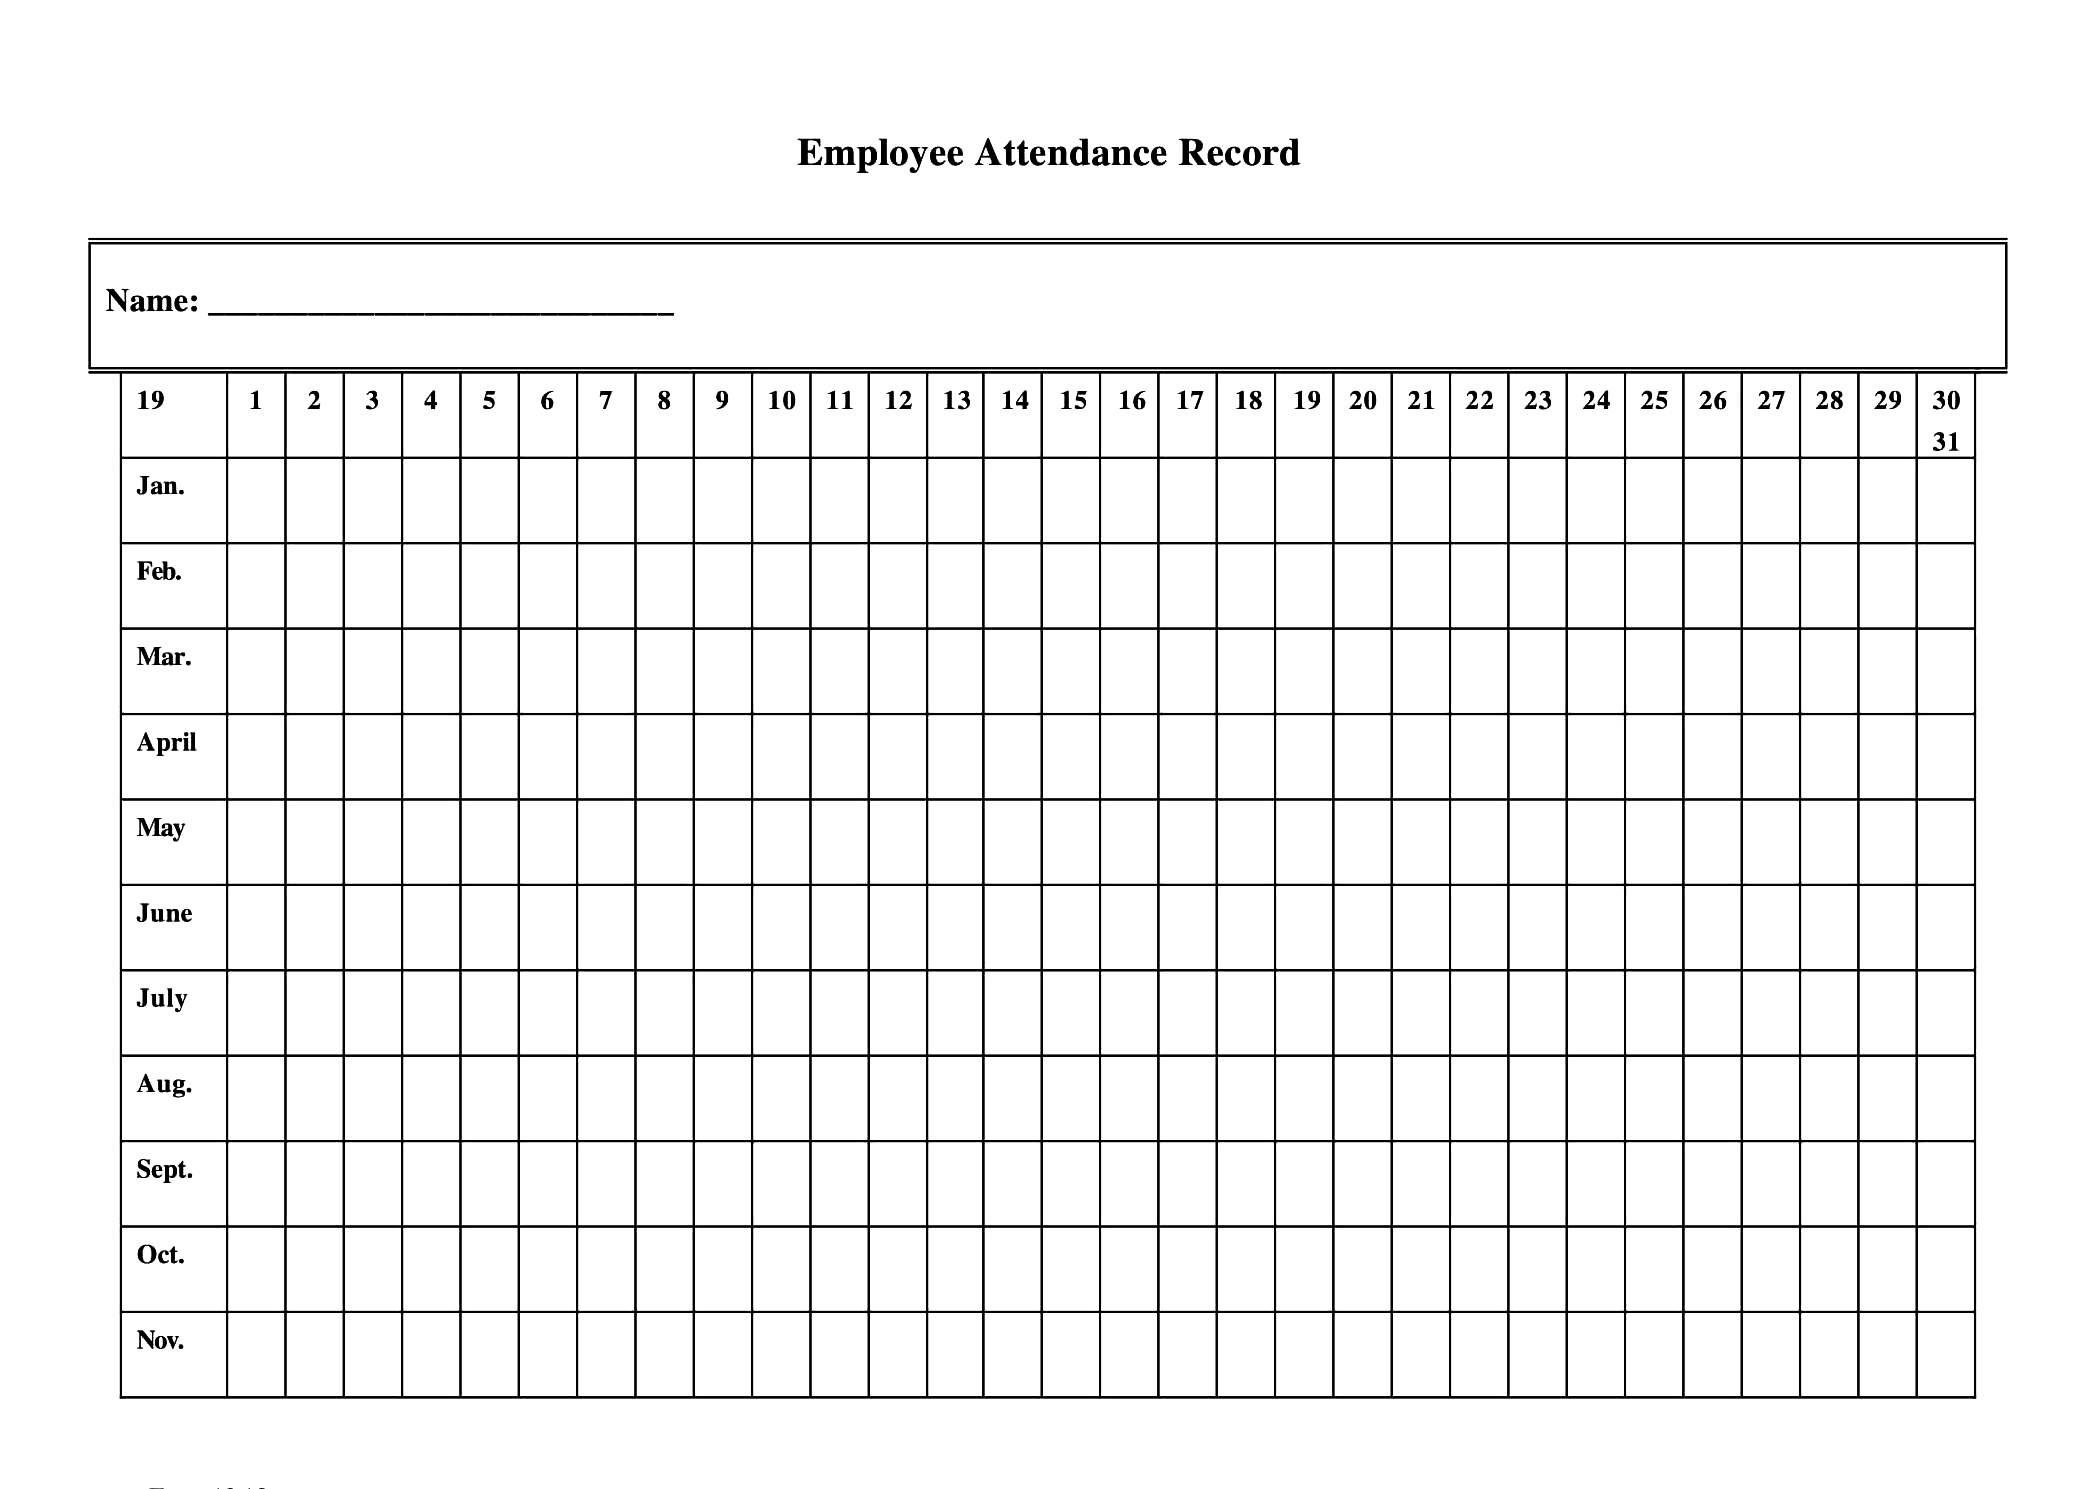 Free Printable Employee Attendance Sheet Pdf, Word, Excel  2020 Employee Attendance Calendar Pdf